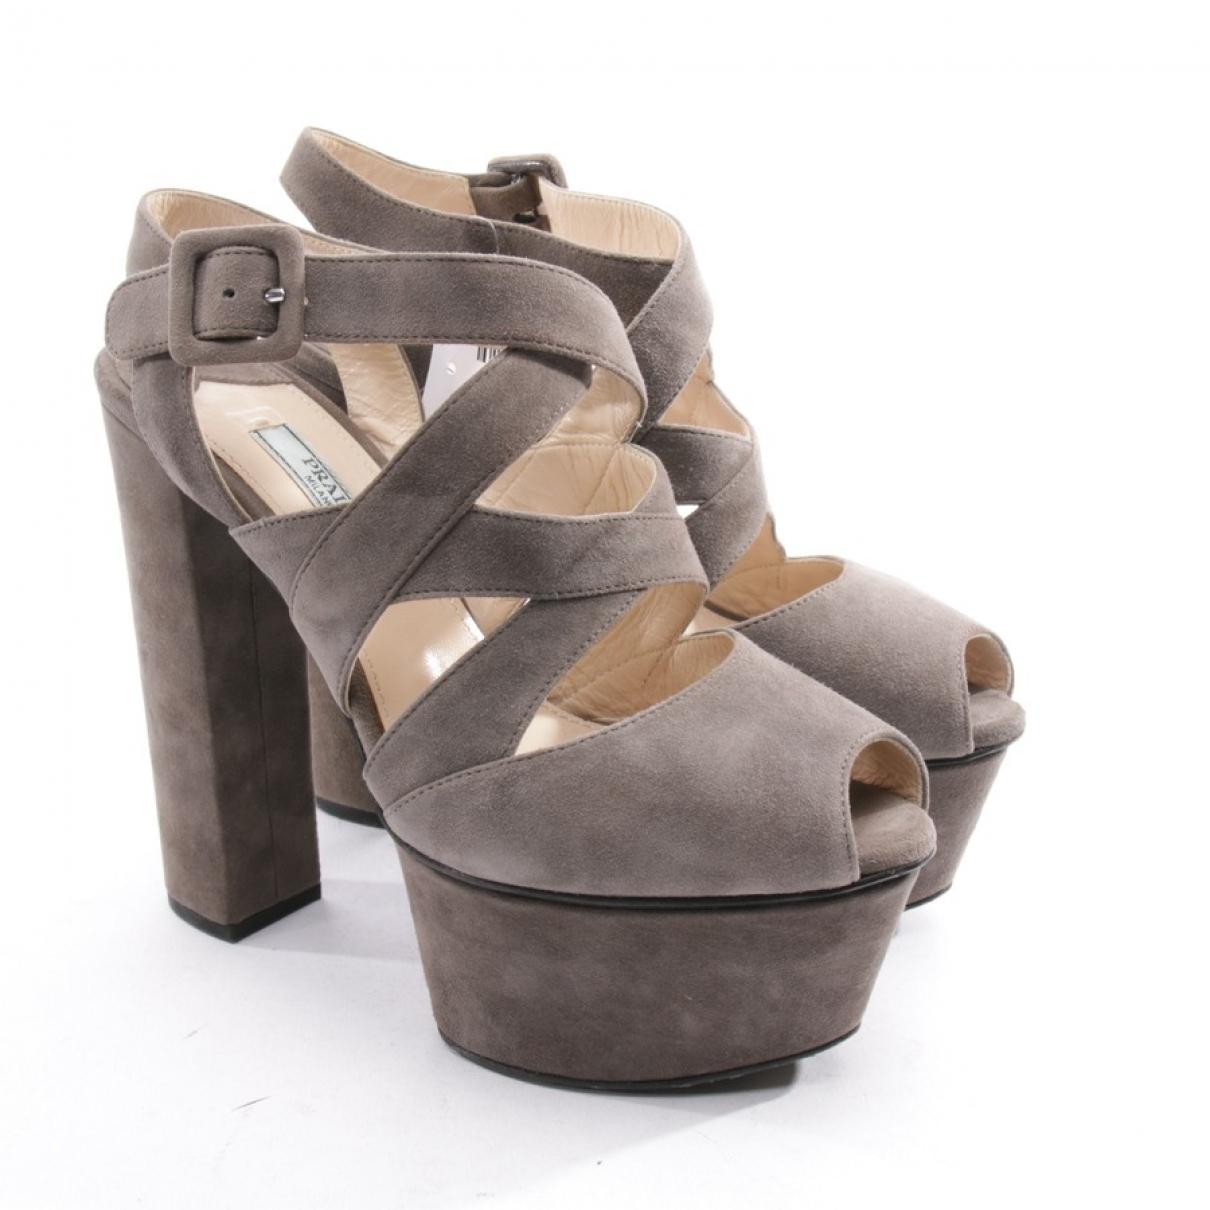 Prada \N Brown Suede Sandals for Women 36.5 EU